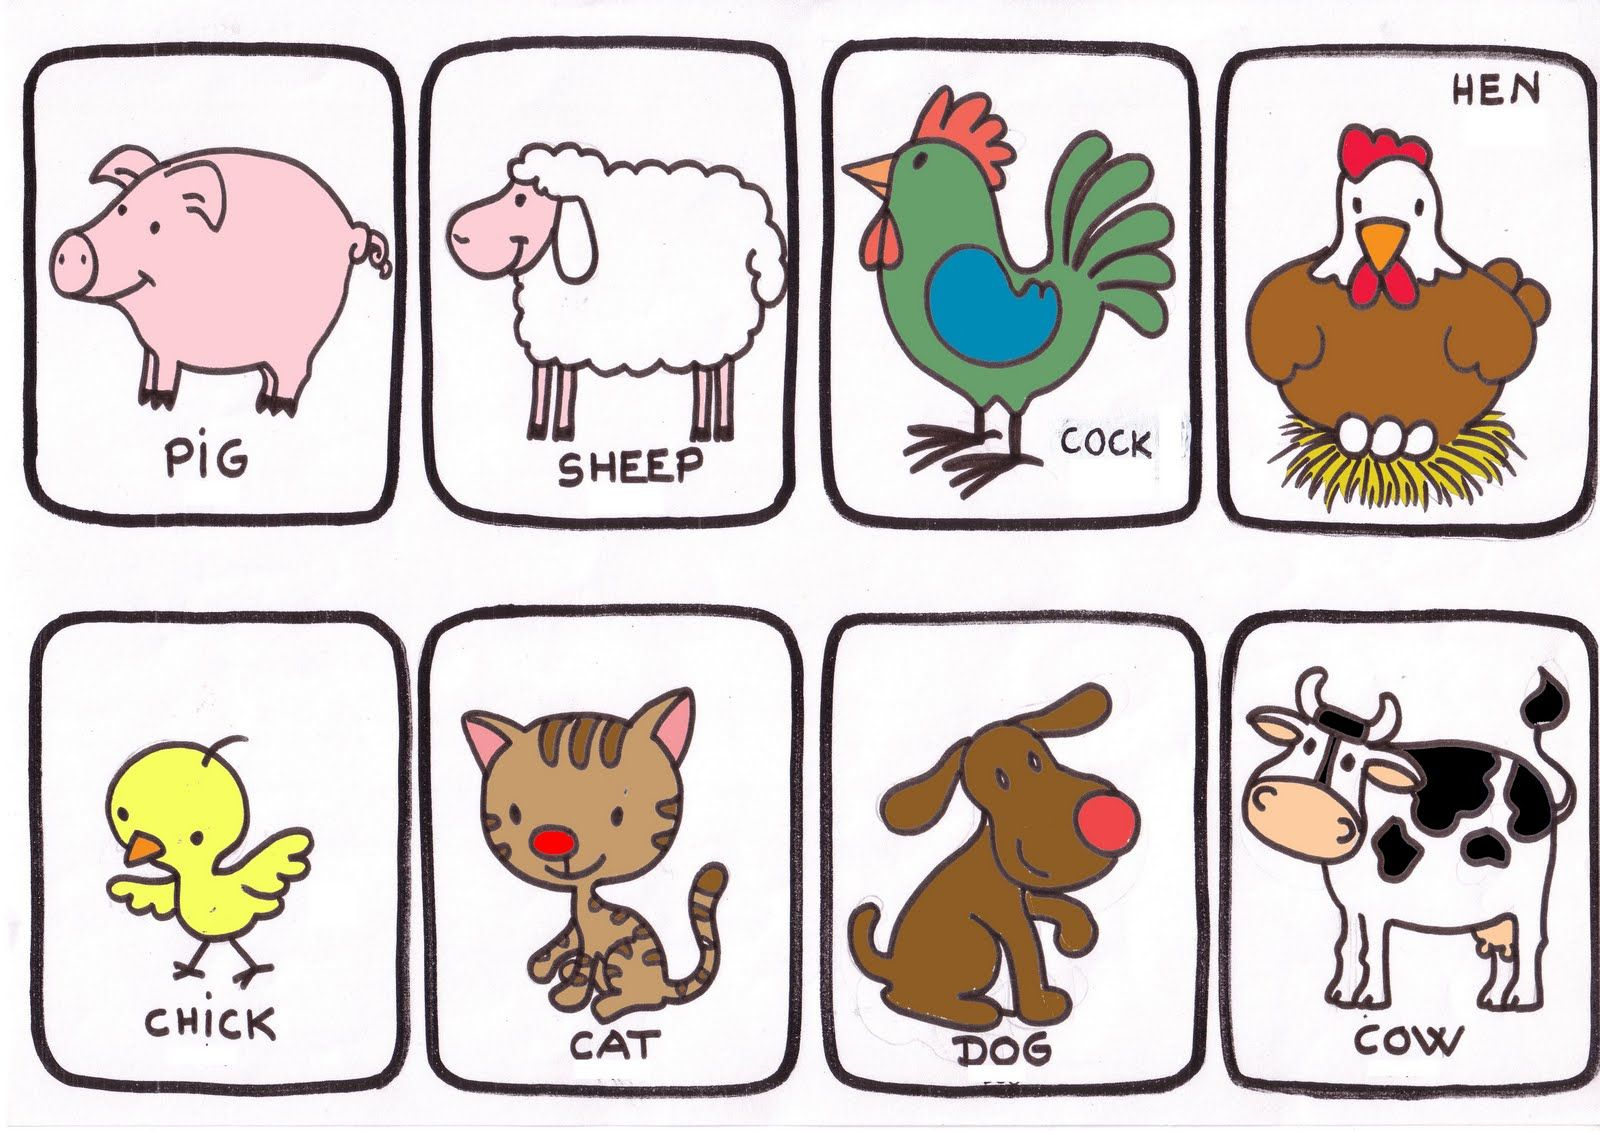 14 Ideas De Granja En Ingles Granja En Ingles Animales De La Granja Animales